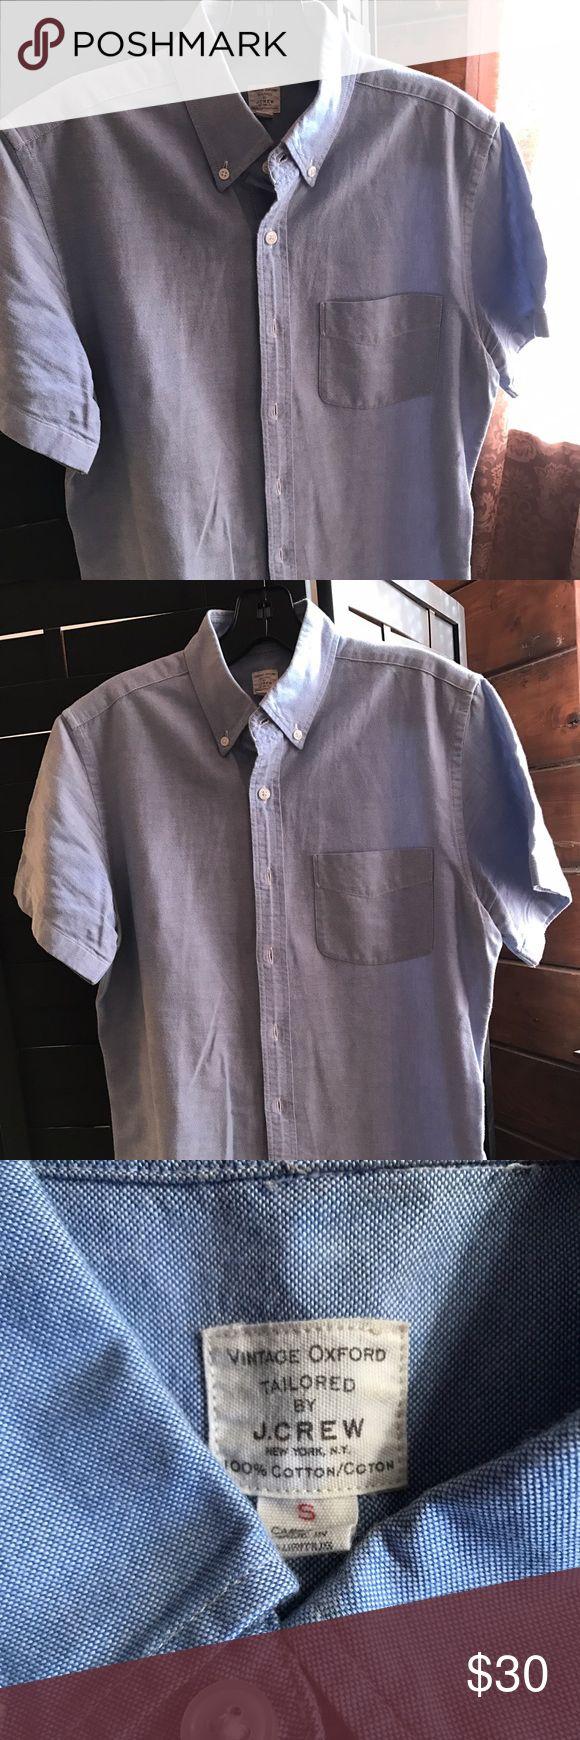 J Crew short sleeve. Vintage Oxford. #poshman J Crew short sleeve. Vintage Oxford. #poshman J. Crew Shirts Casual Button Down Shirts